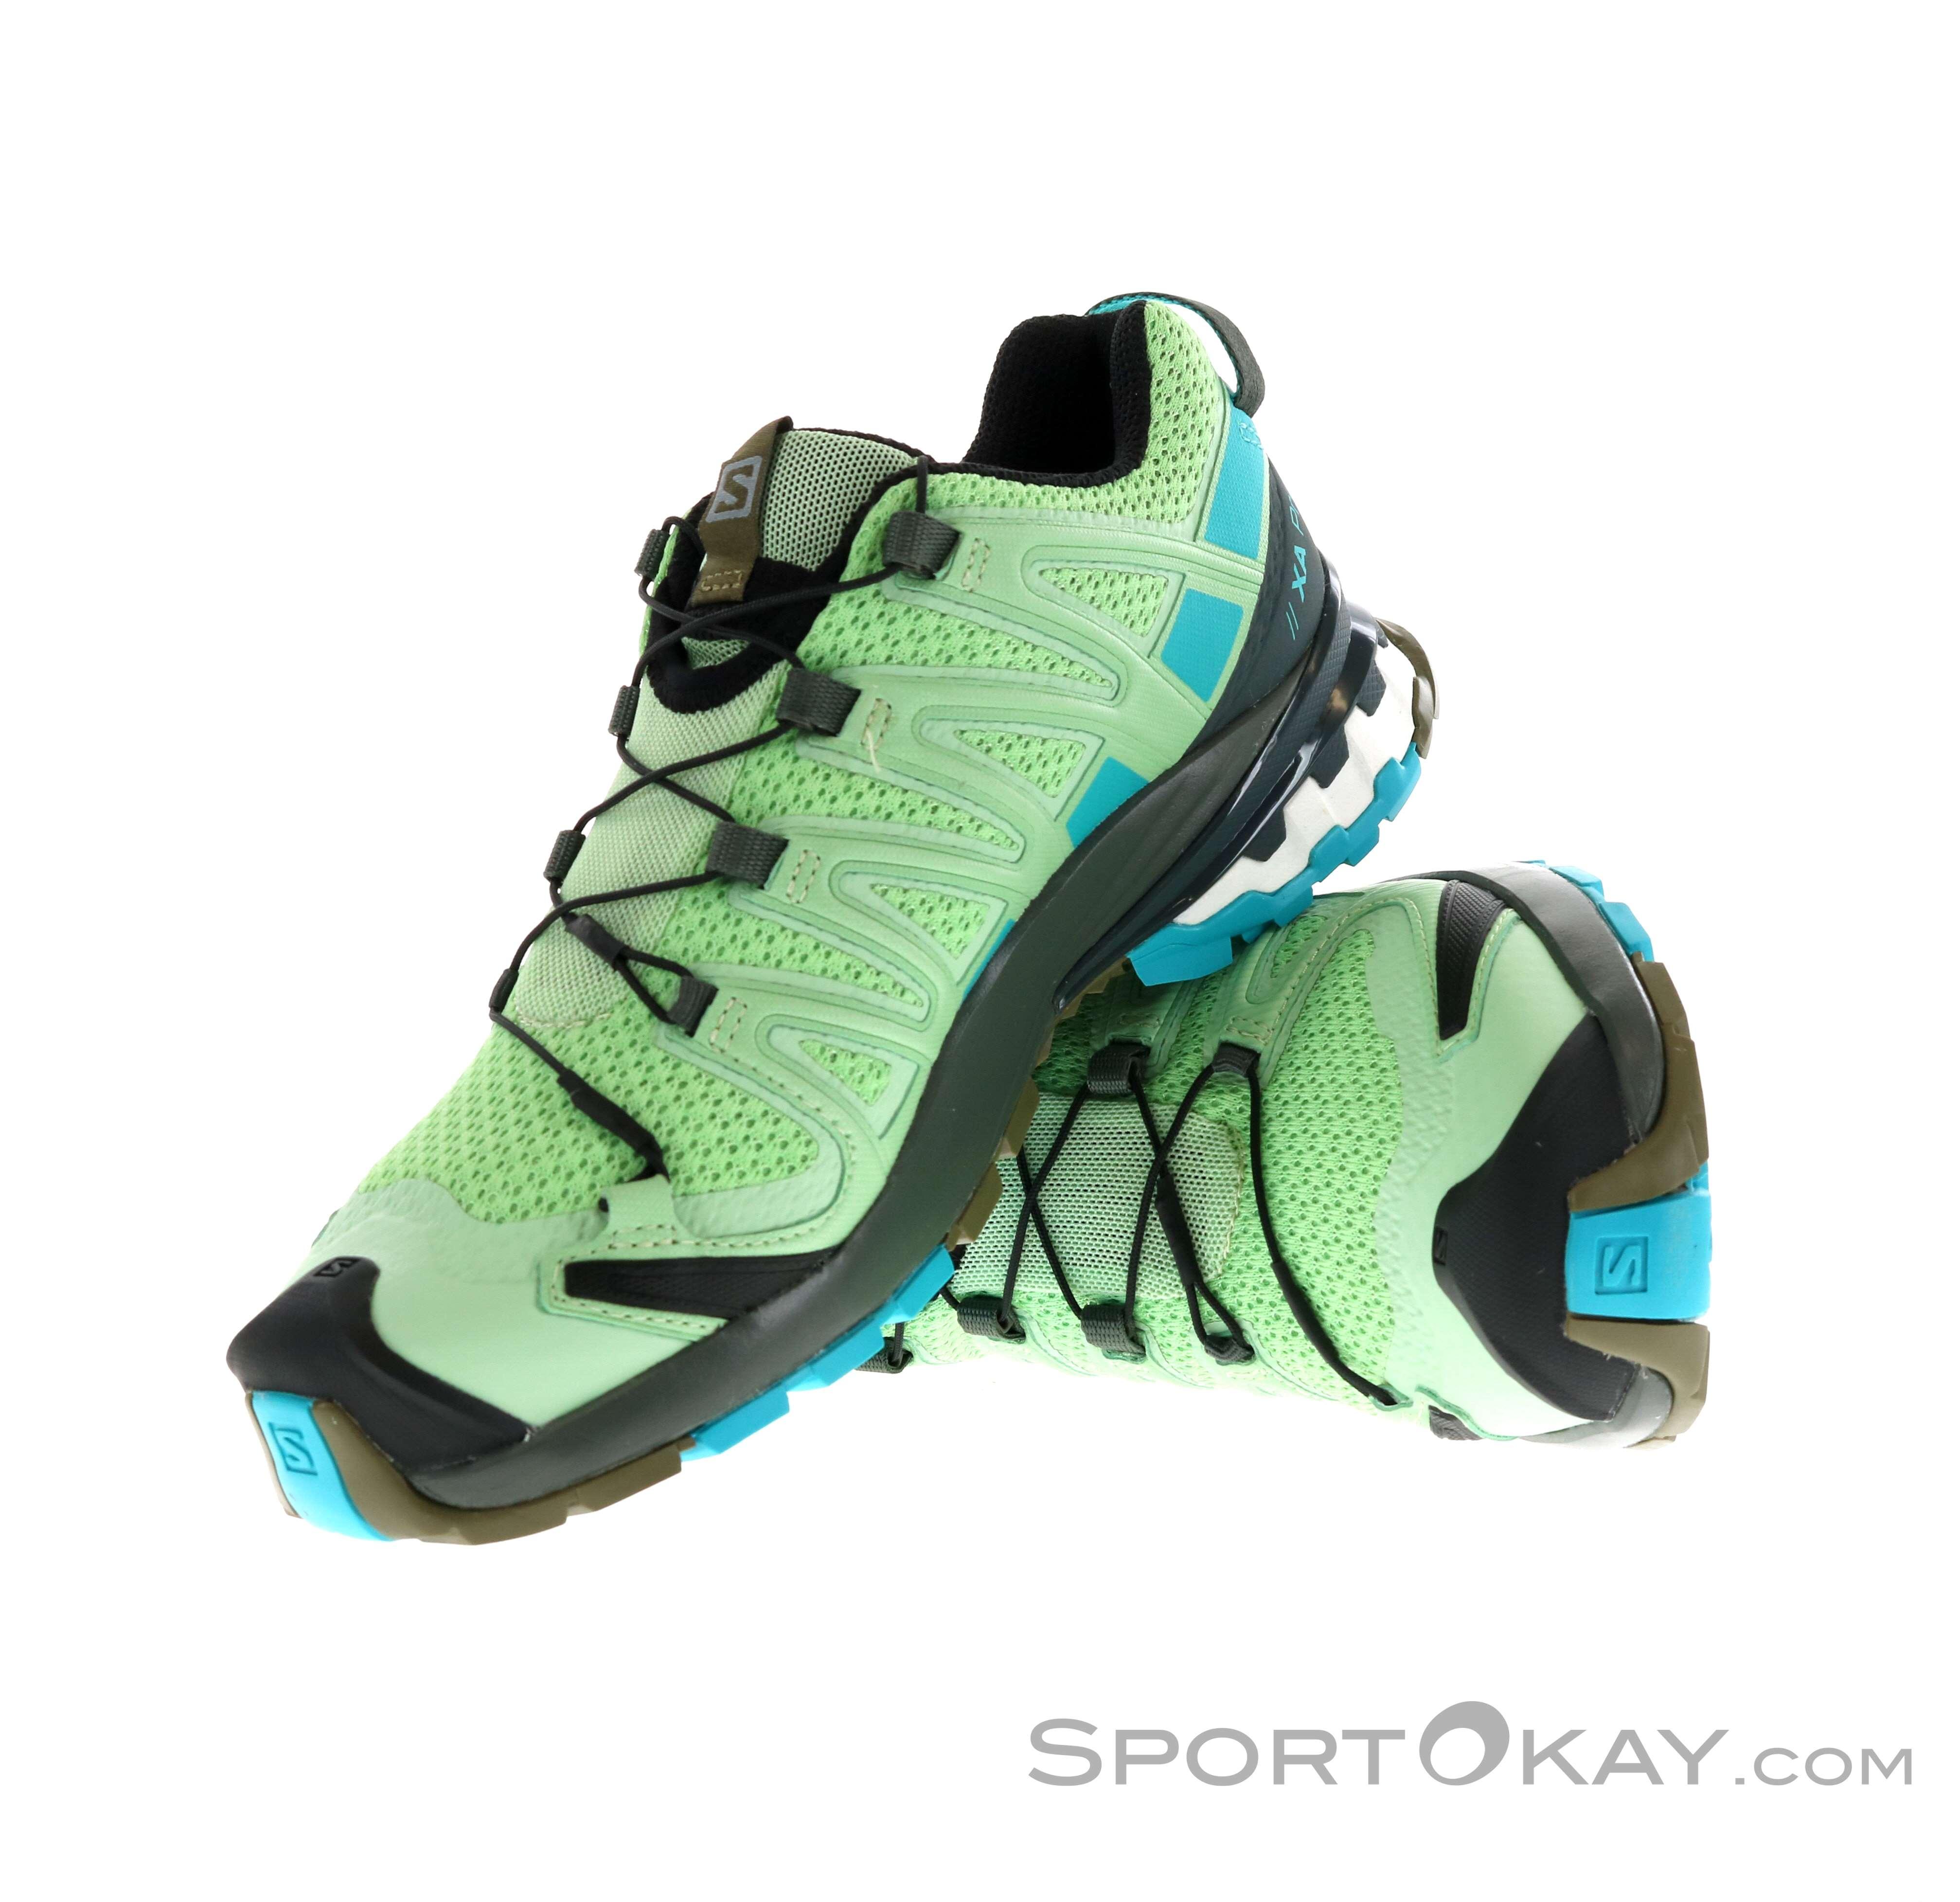 Salomon XA Pro 3D V8 Womens Trail Running Shoes Trail 9qxxj